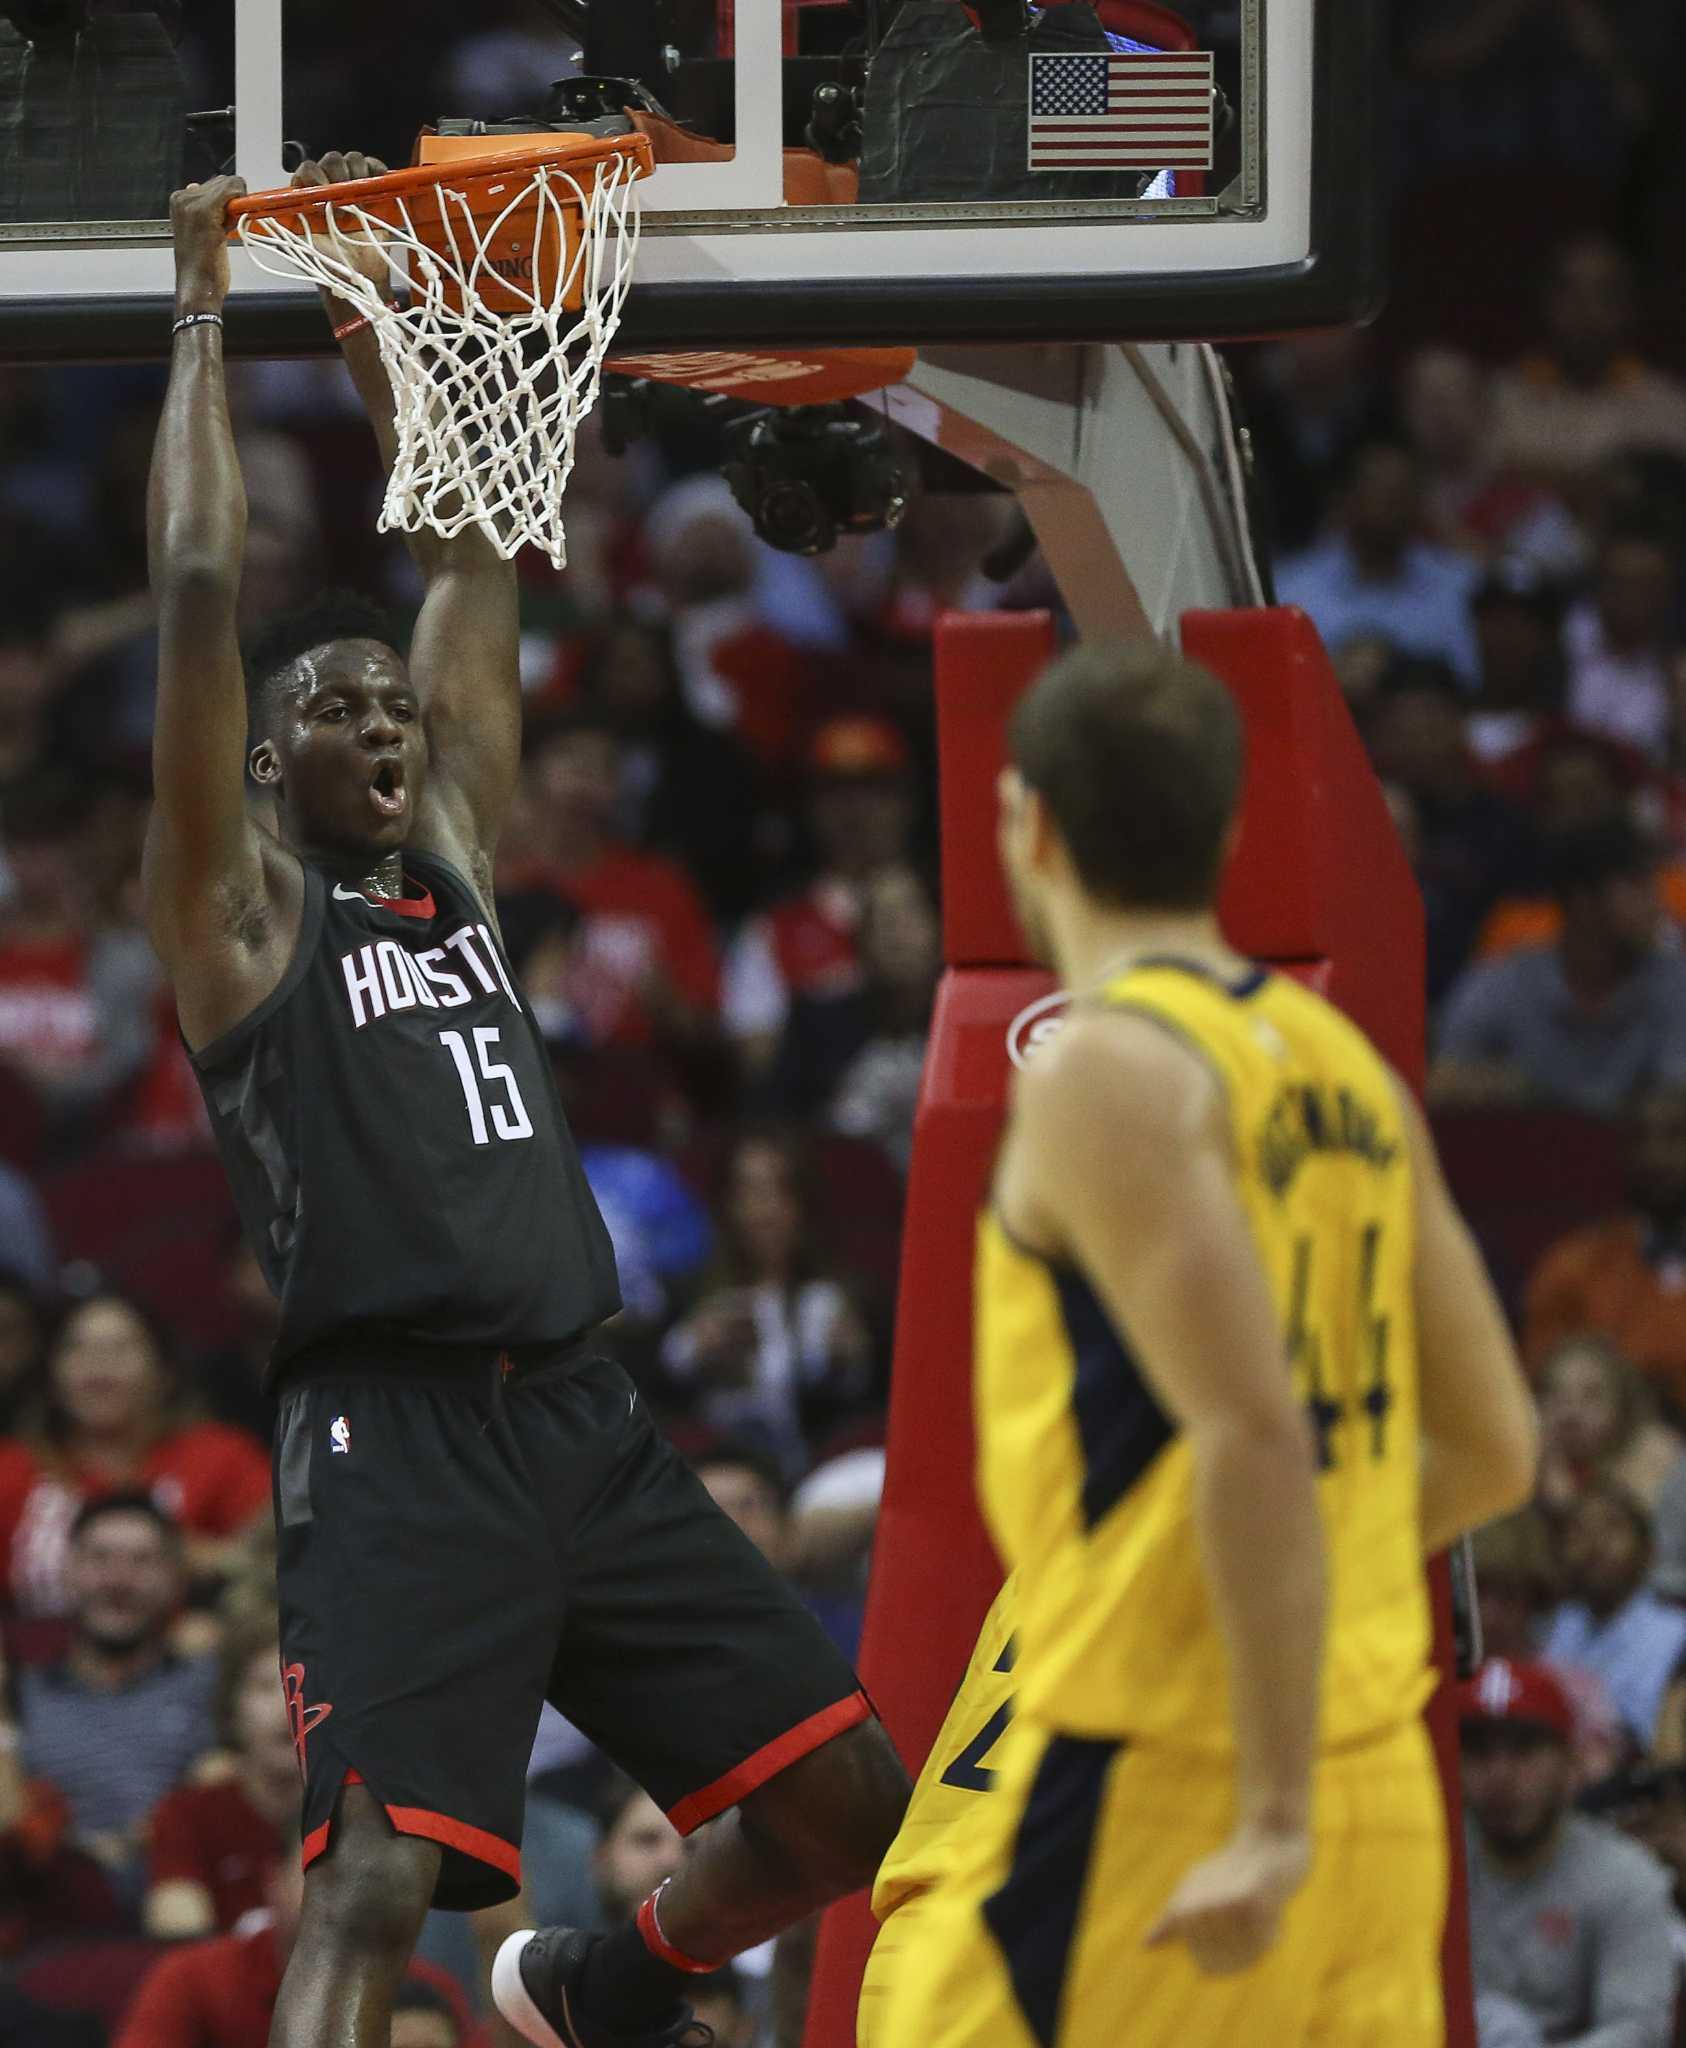 Houston Rockets 3rd Quarter Stats: Aggressive Approach Works For Rockets Center Clint Capela